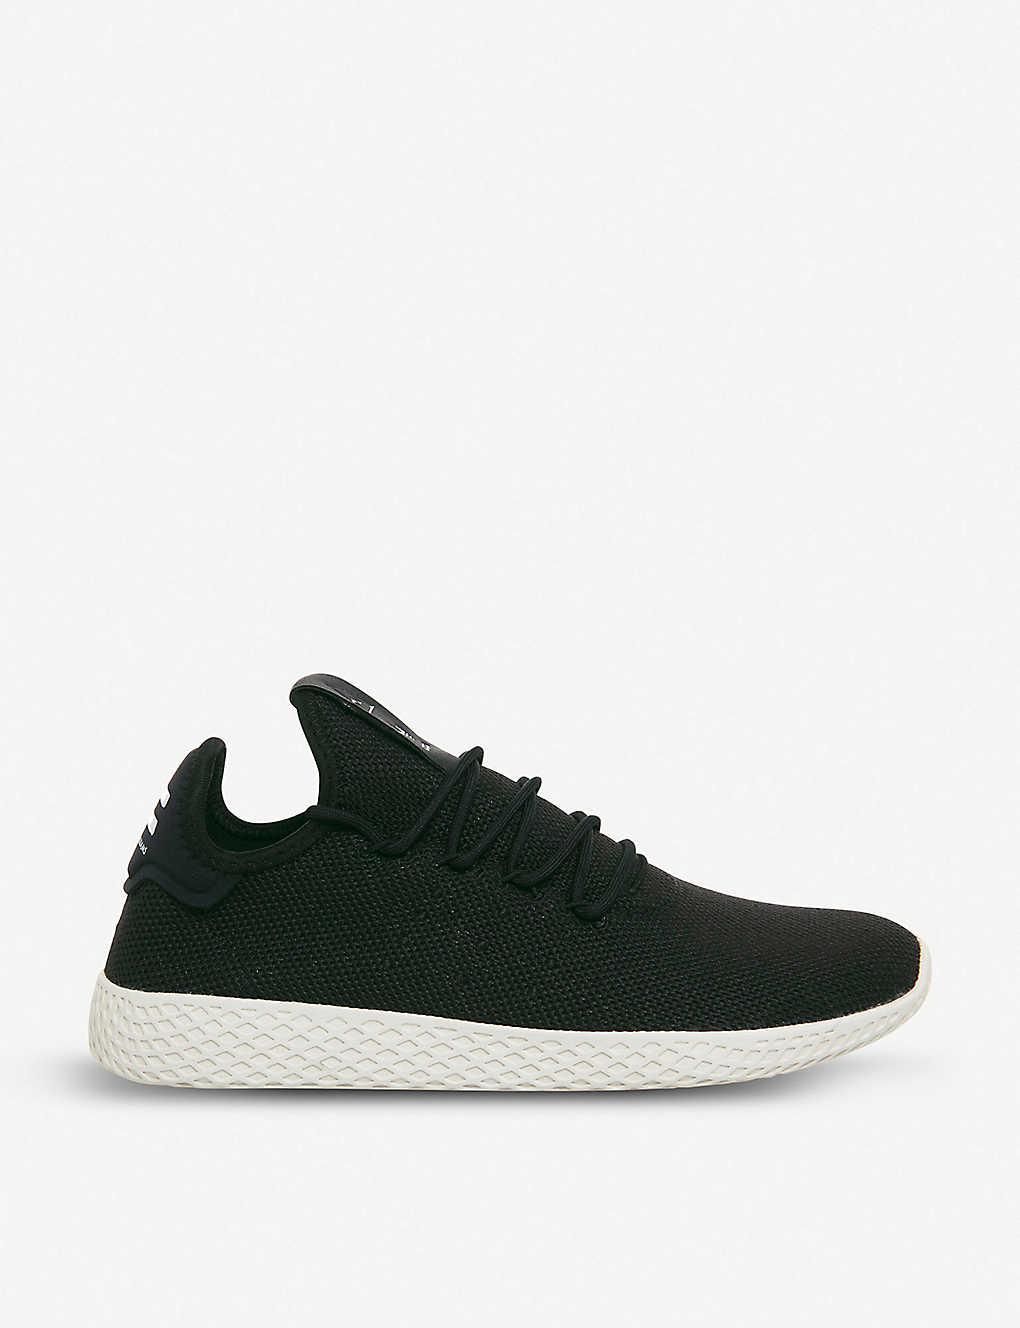 39017fdf0 adidas x Pharrell Williams Tennis Hu knit trainers - Core black ...